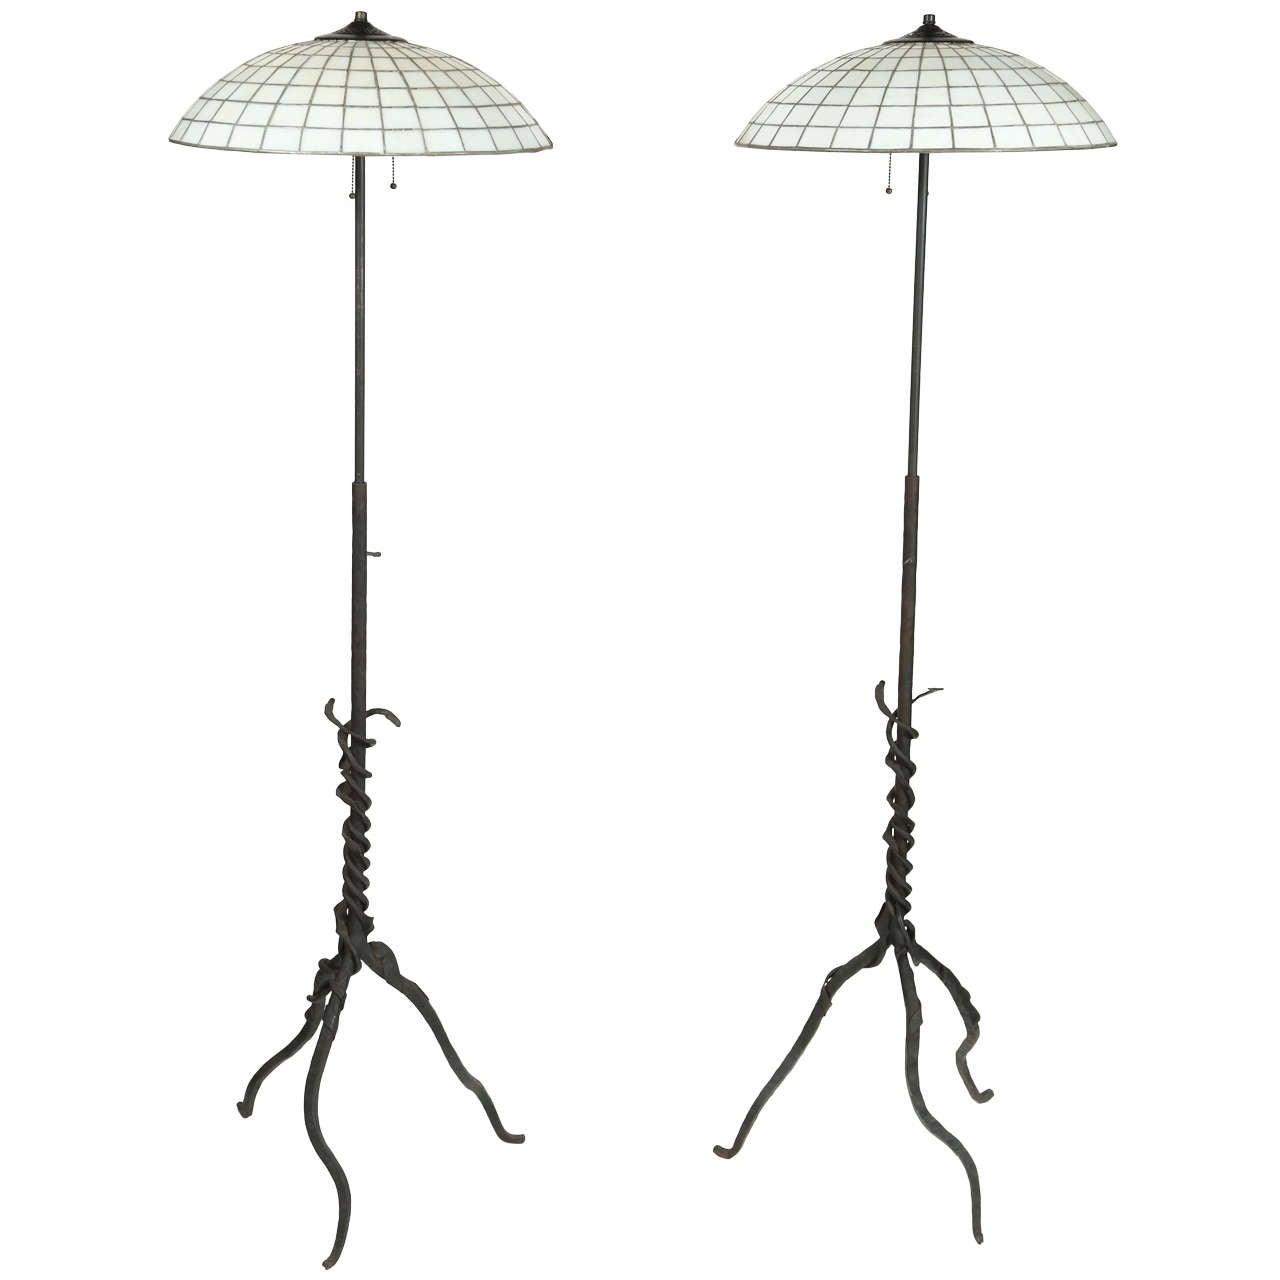 arts and crafts style floor lamp at 1stdibs. Black Bedroom Furniture Sets. Home Design Ideas